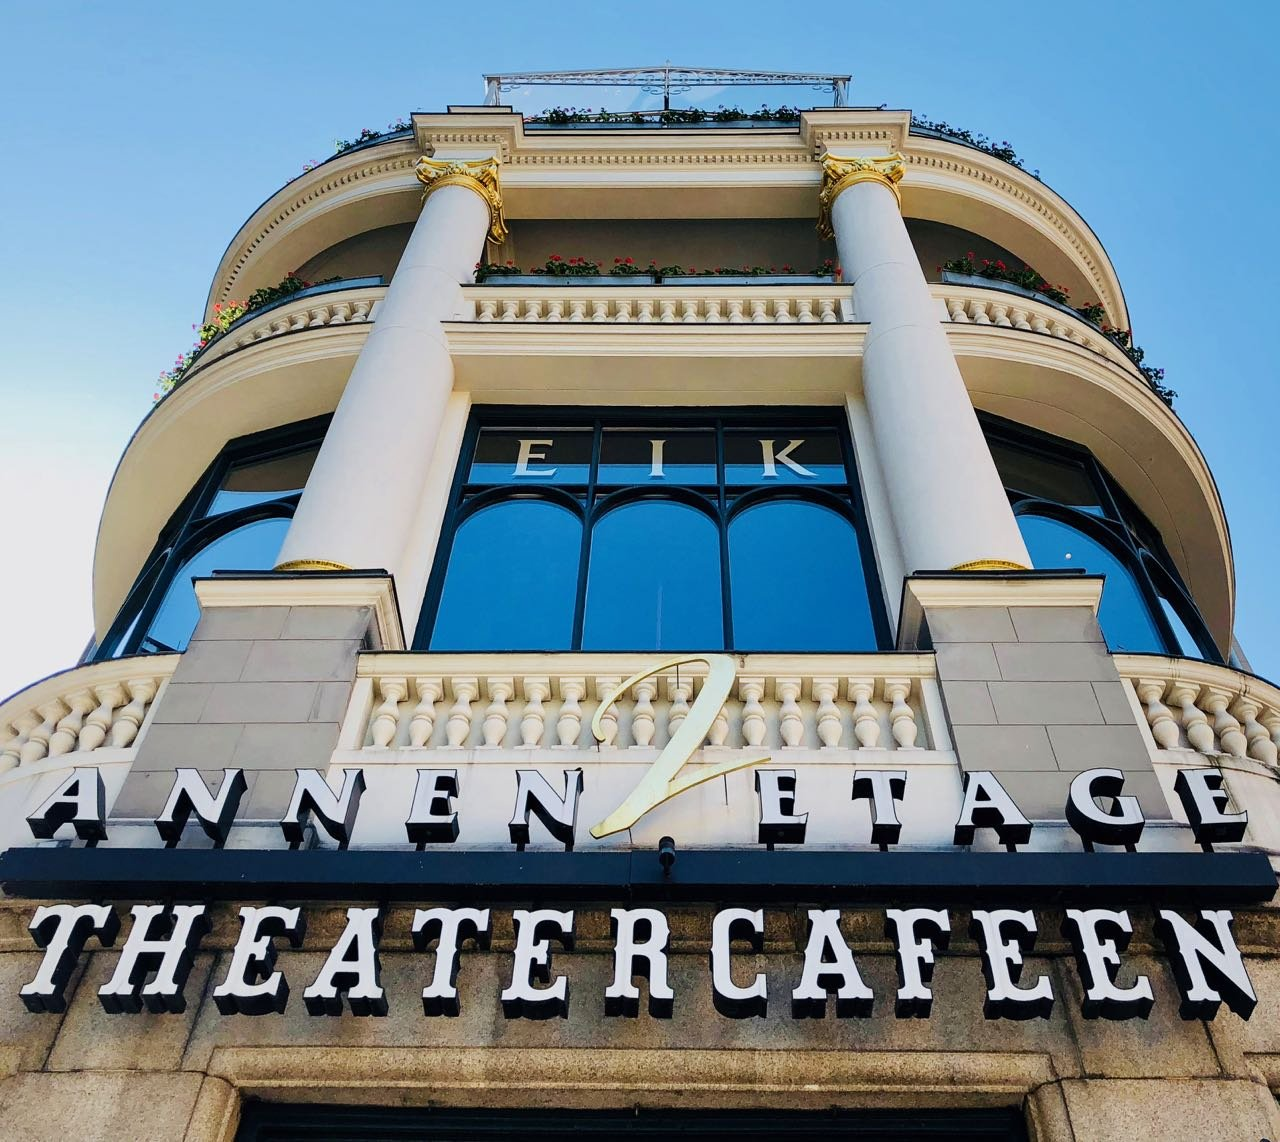 Best Afternoon Tea Oslo Theatercaféen review